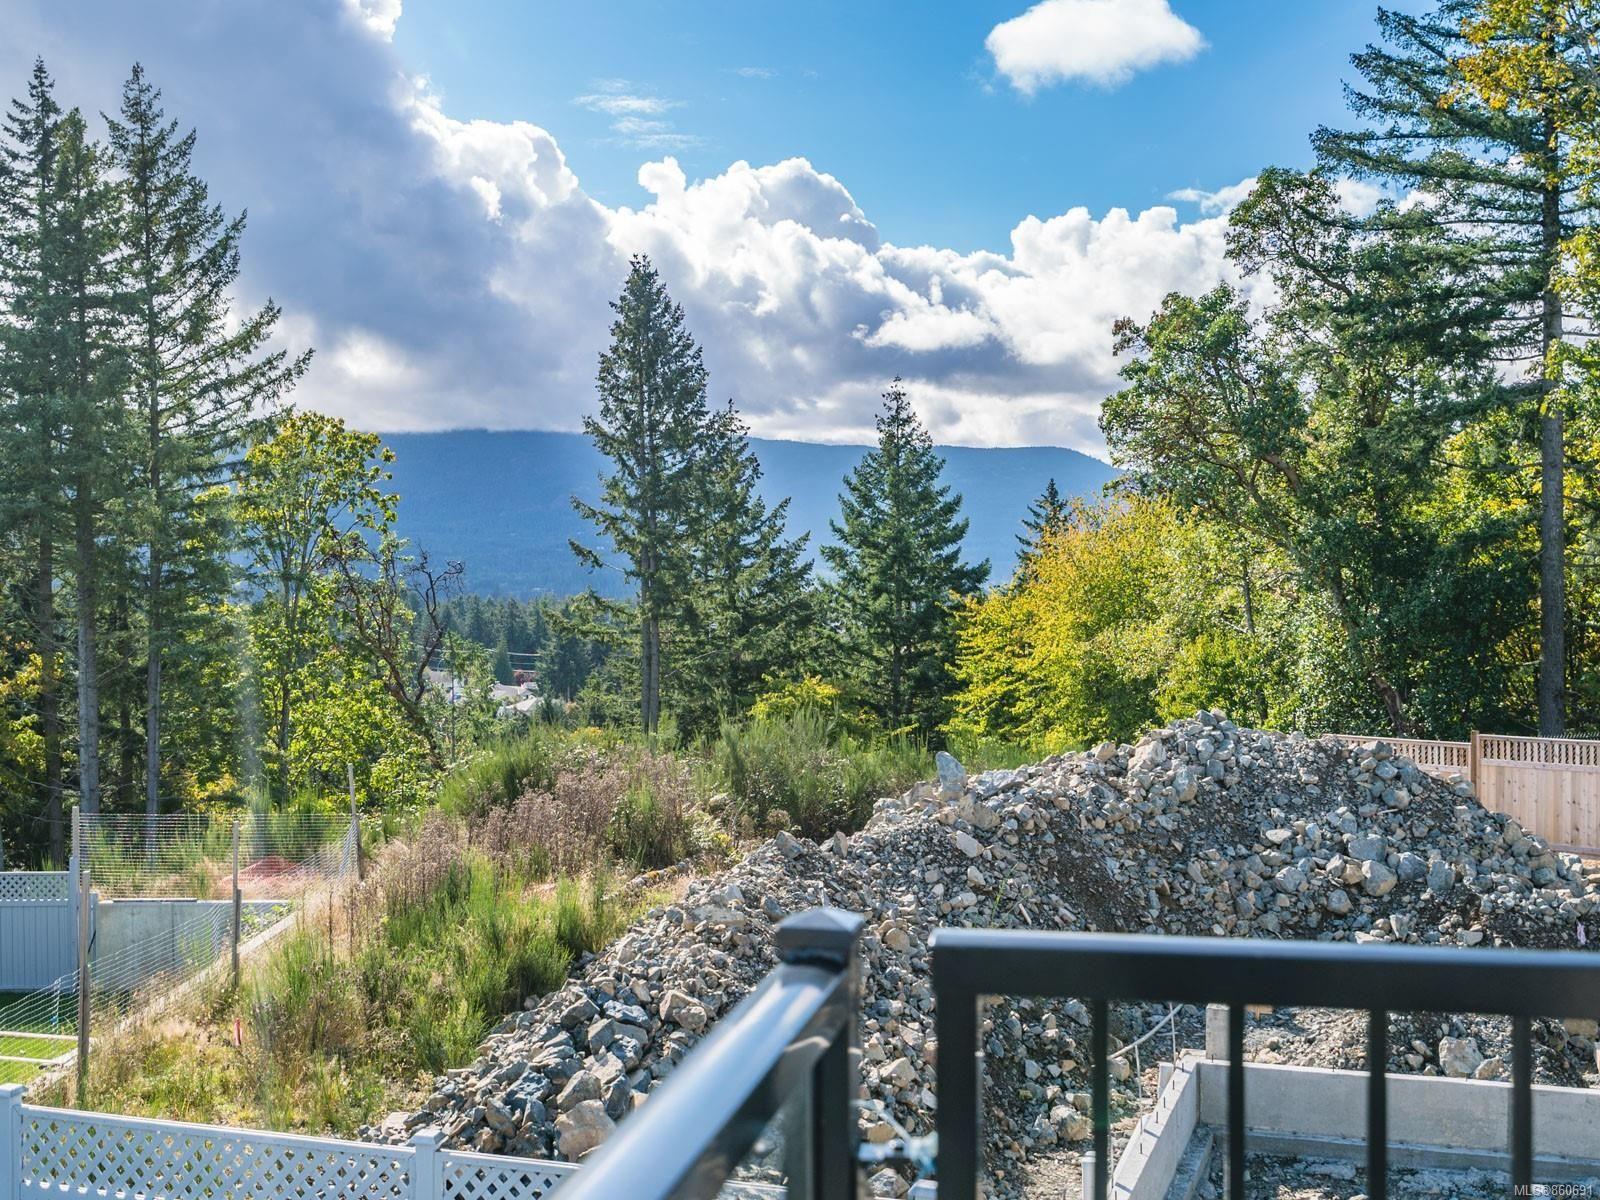 Photo 51: Photos: 5821 Linley Valley Dr in : Na North Nanaimo House for sale (Nanaimo)  : MLS®# 860691